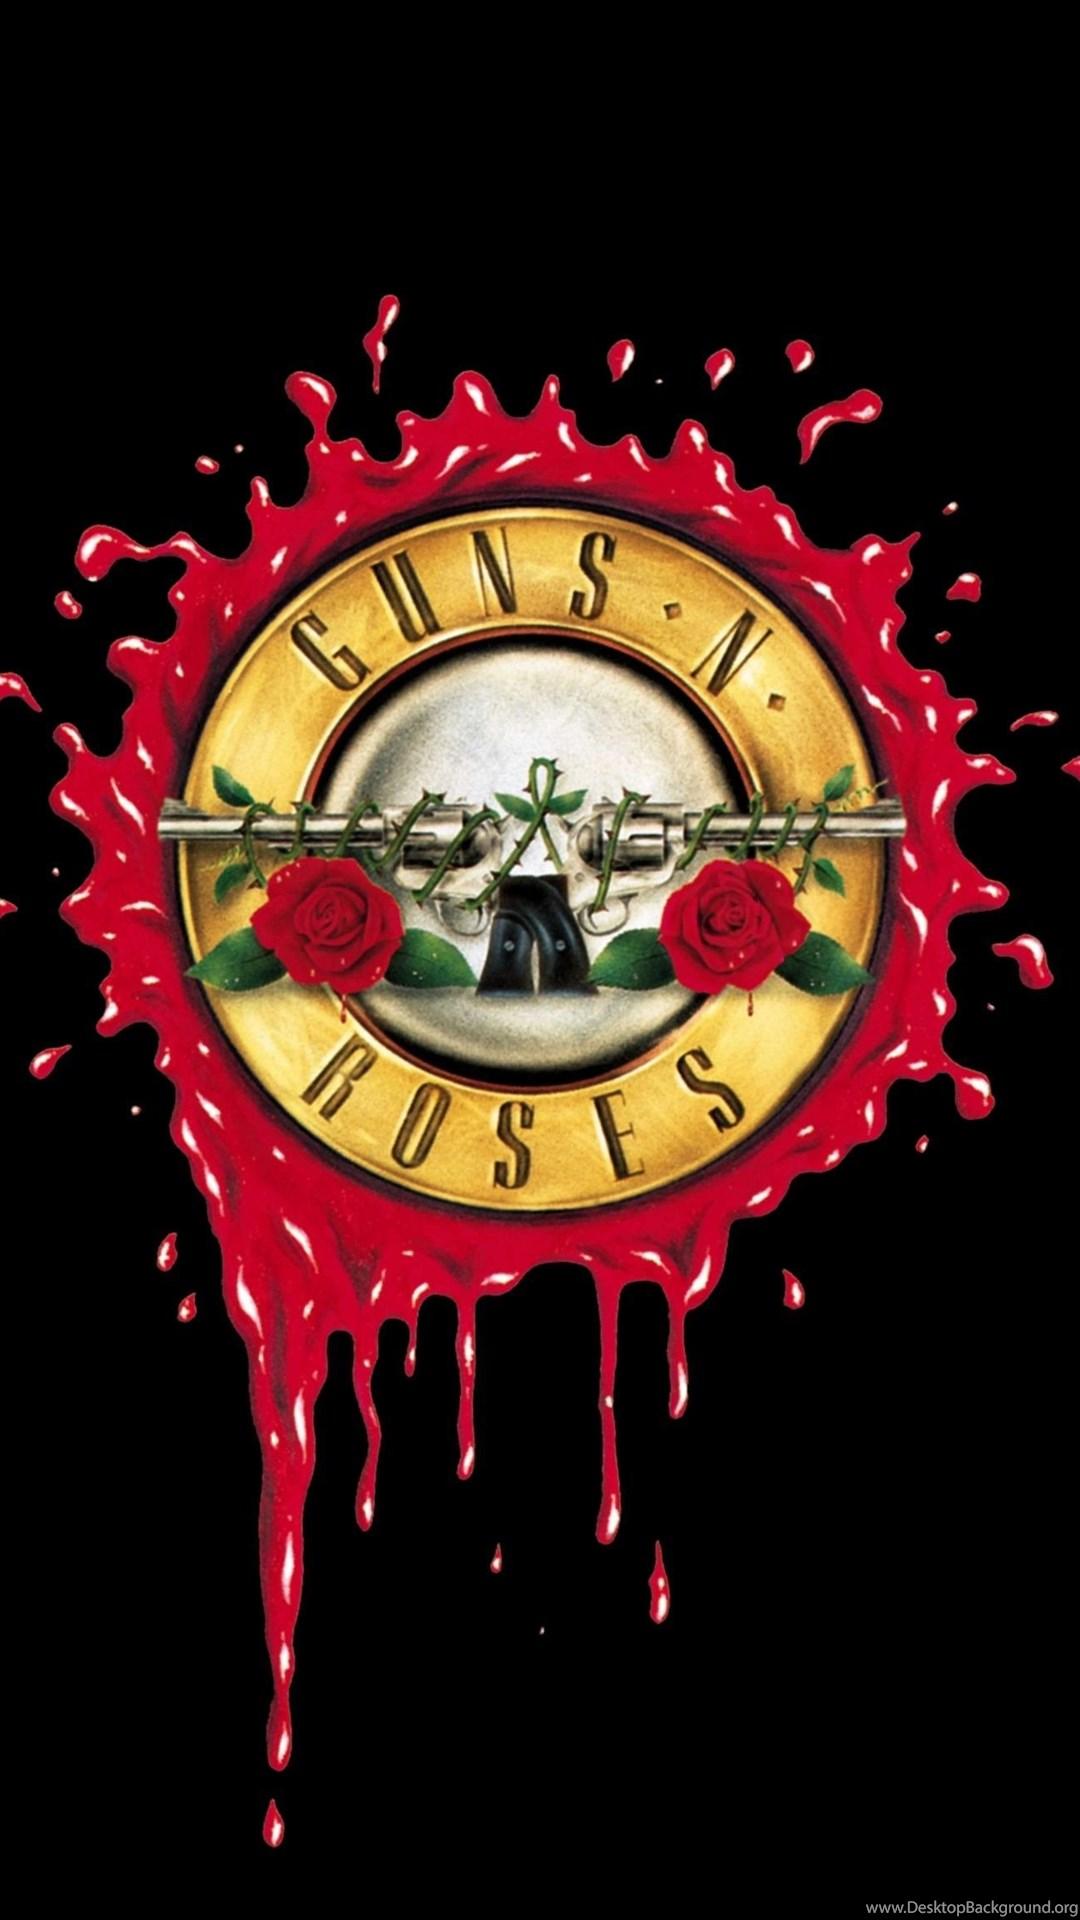 Guns N Roses Logo Awesome Full HD Wallpapers Desktop ...